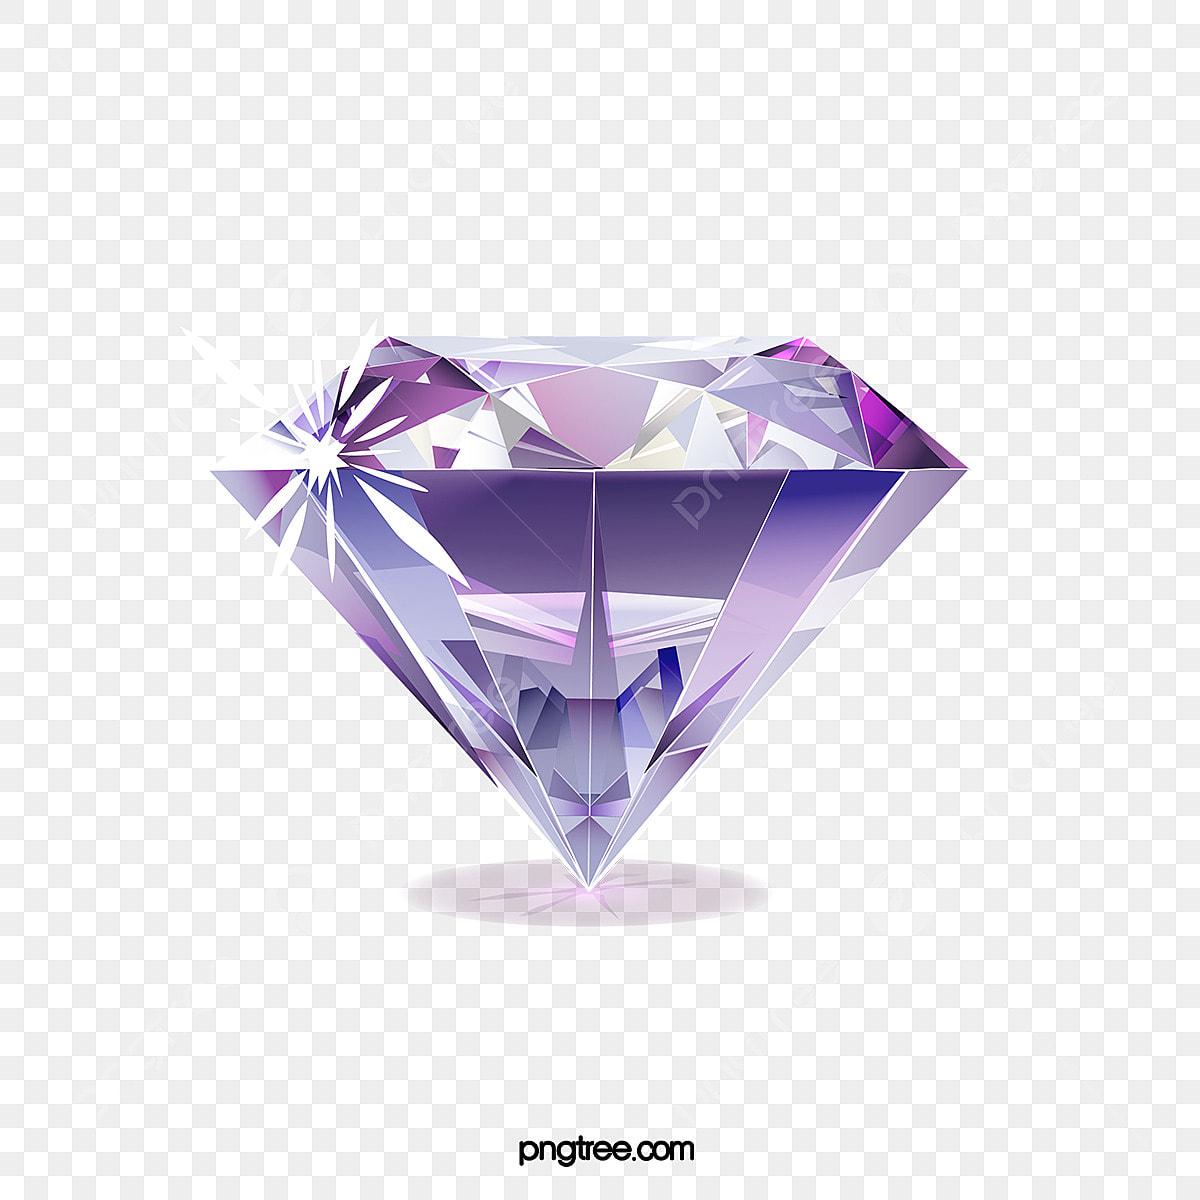 Diamond color. Glowing diamonds blocks png